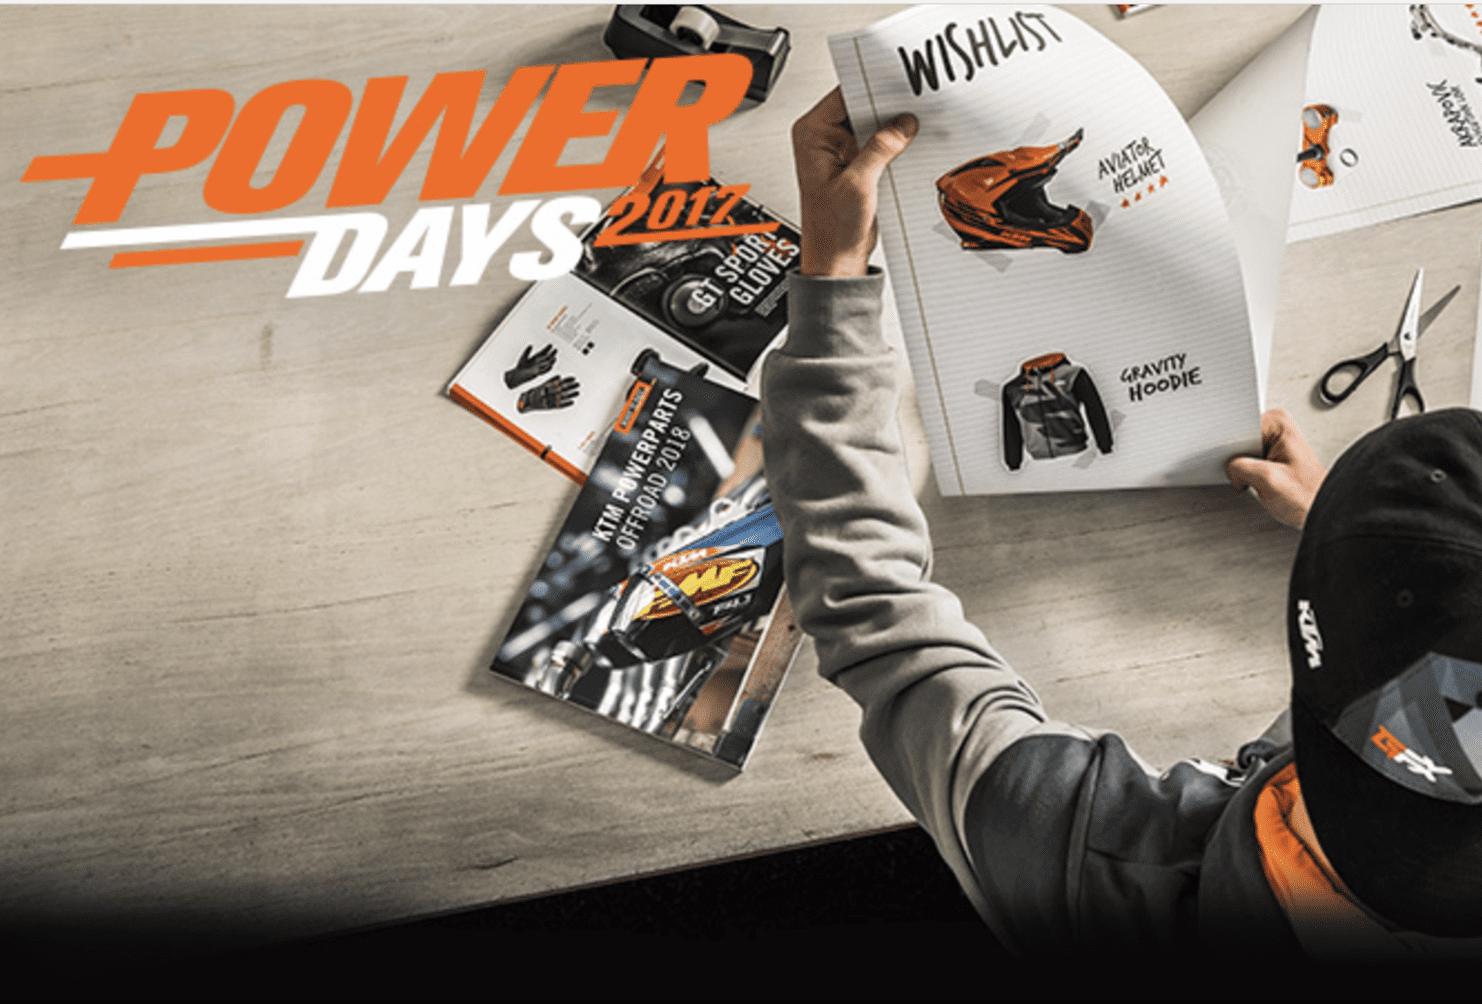 KTM PowerDays 2017